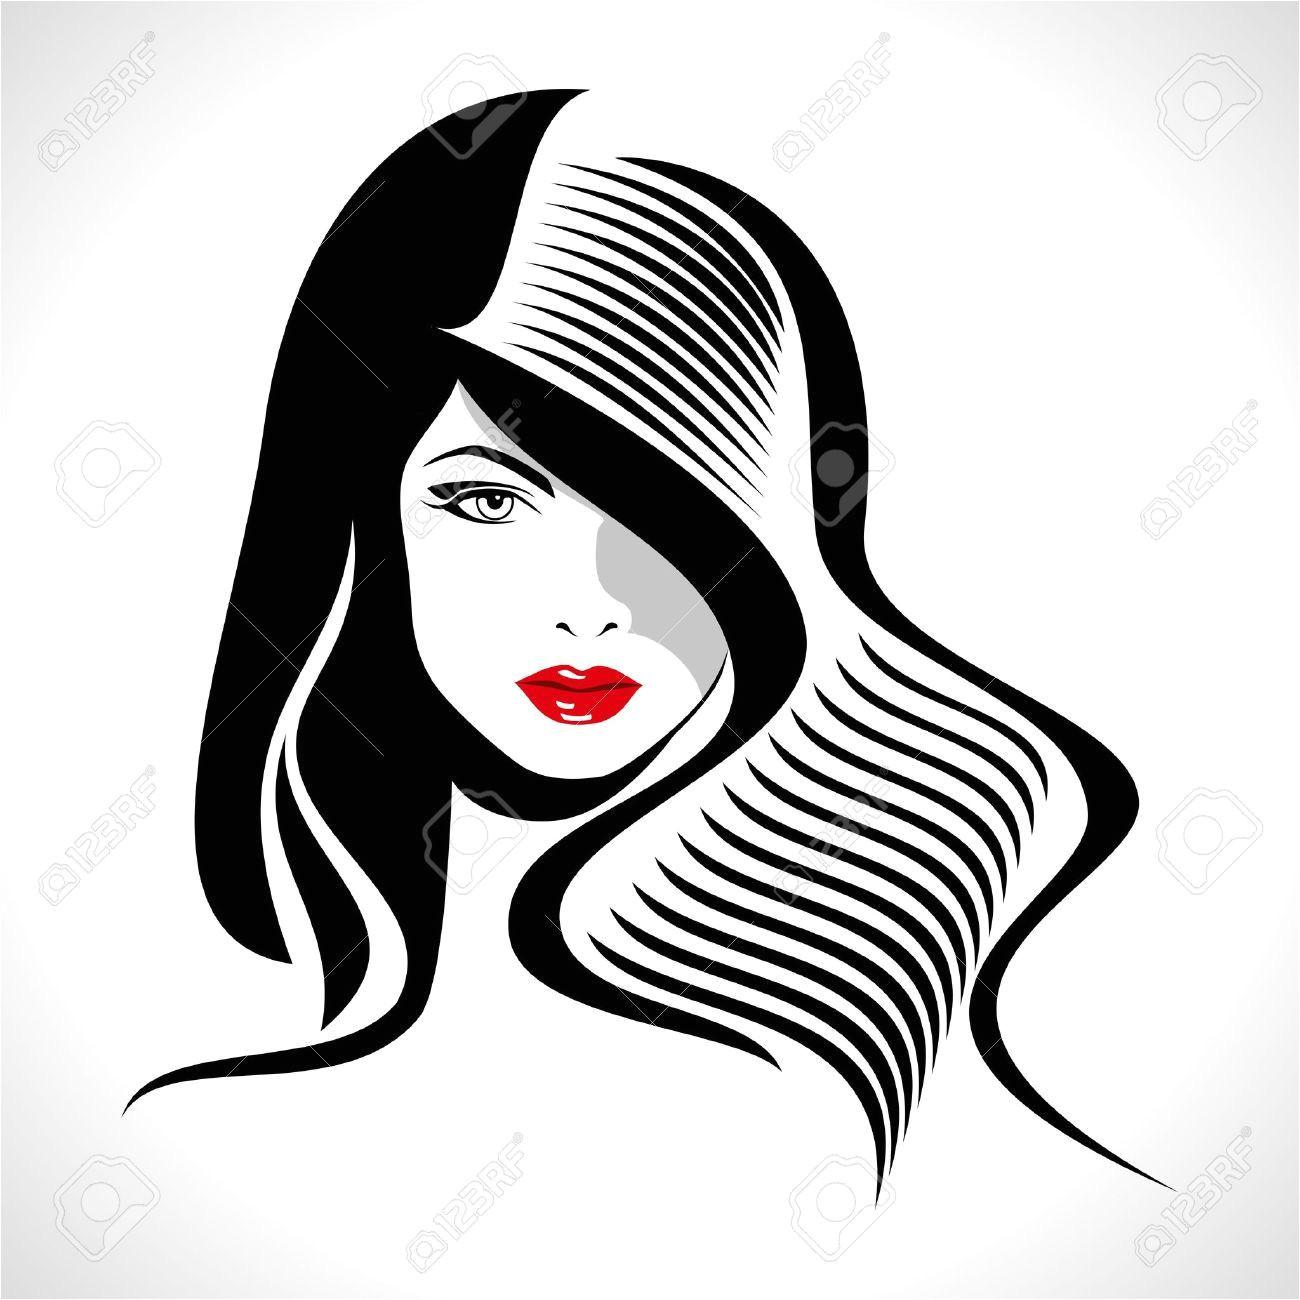 barbershop logo design Google Search Girl Silhouette Silhouette Vector Silhouette Pop